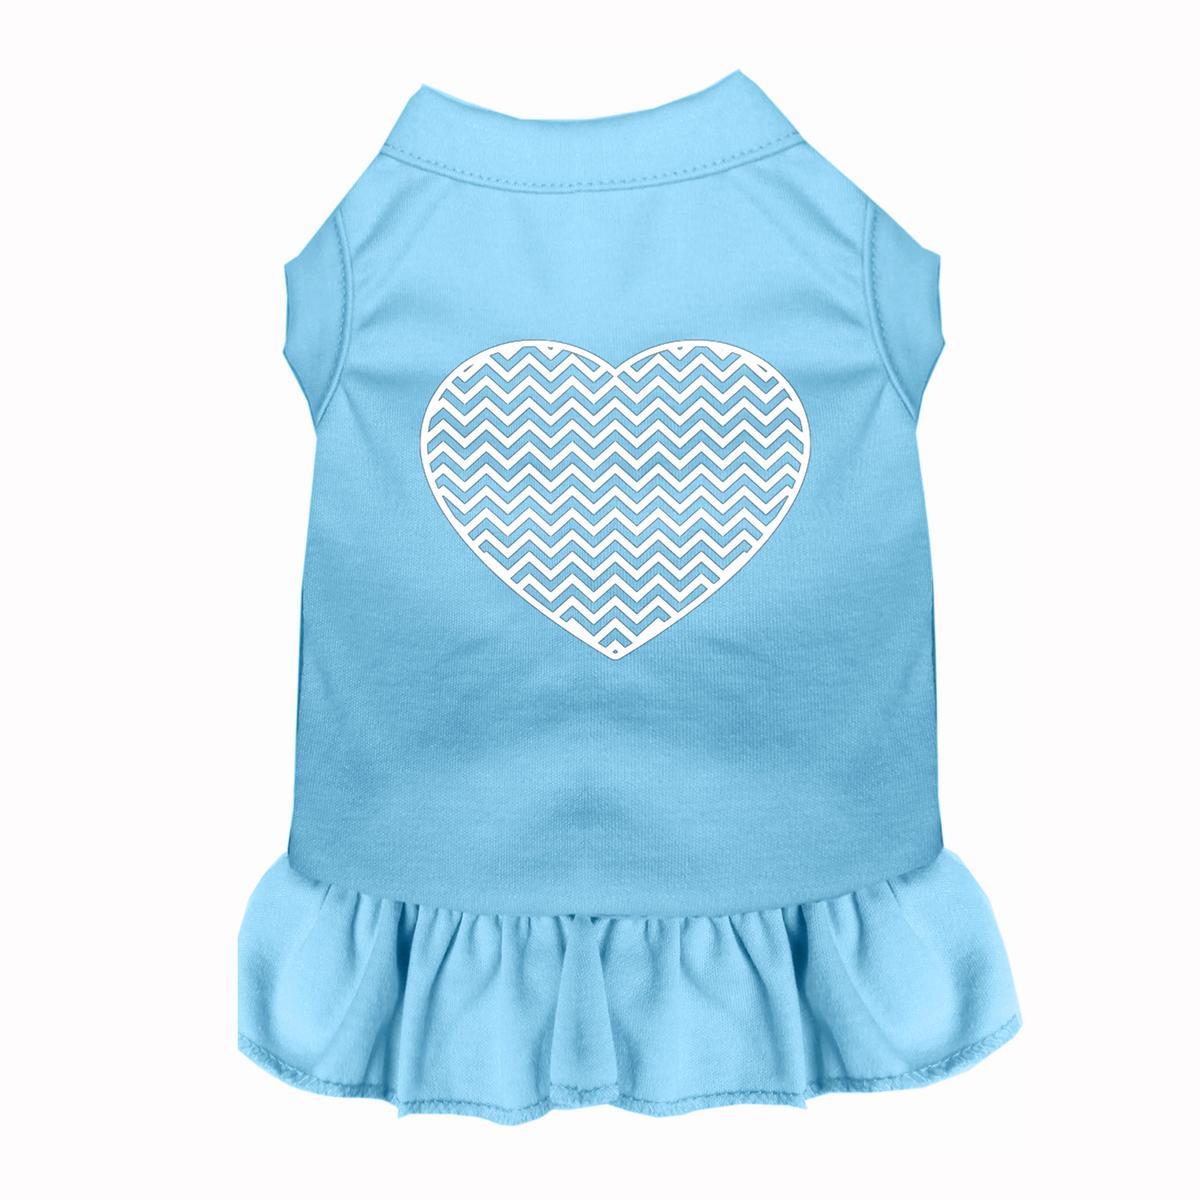 Chevron Heart Screen Print Dog Dress - Baby Blue